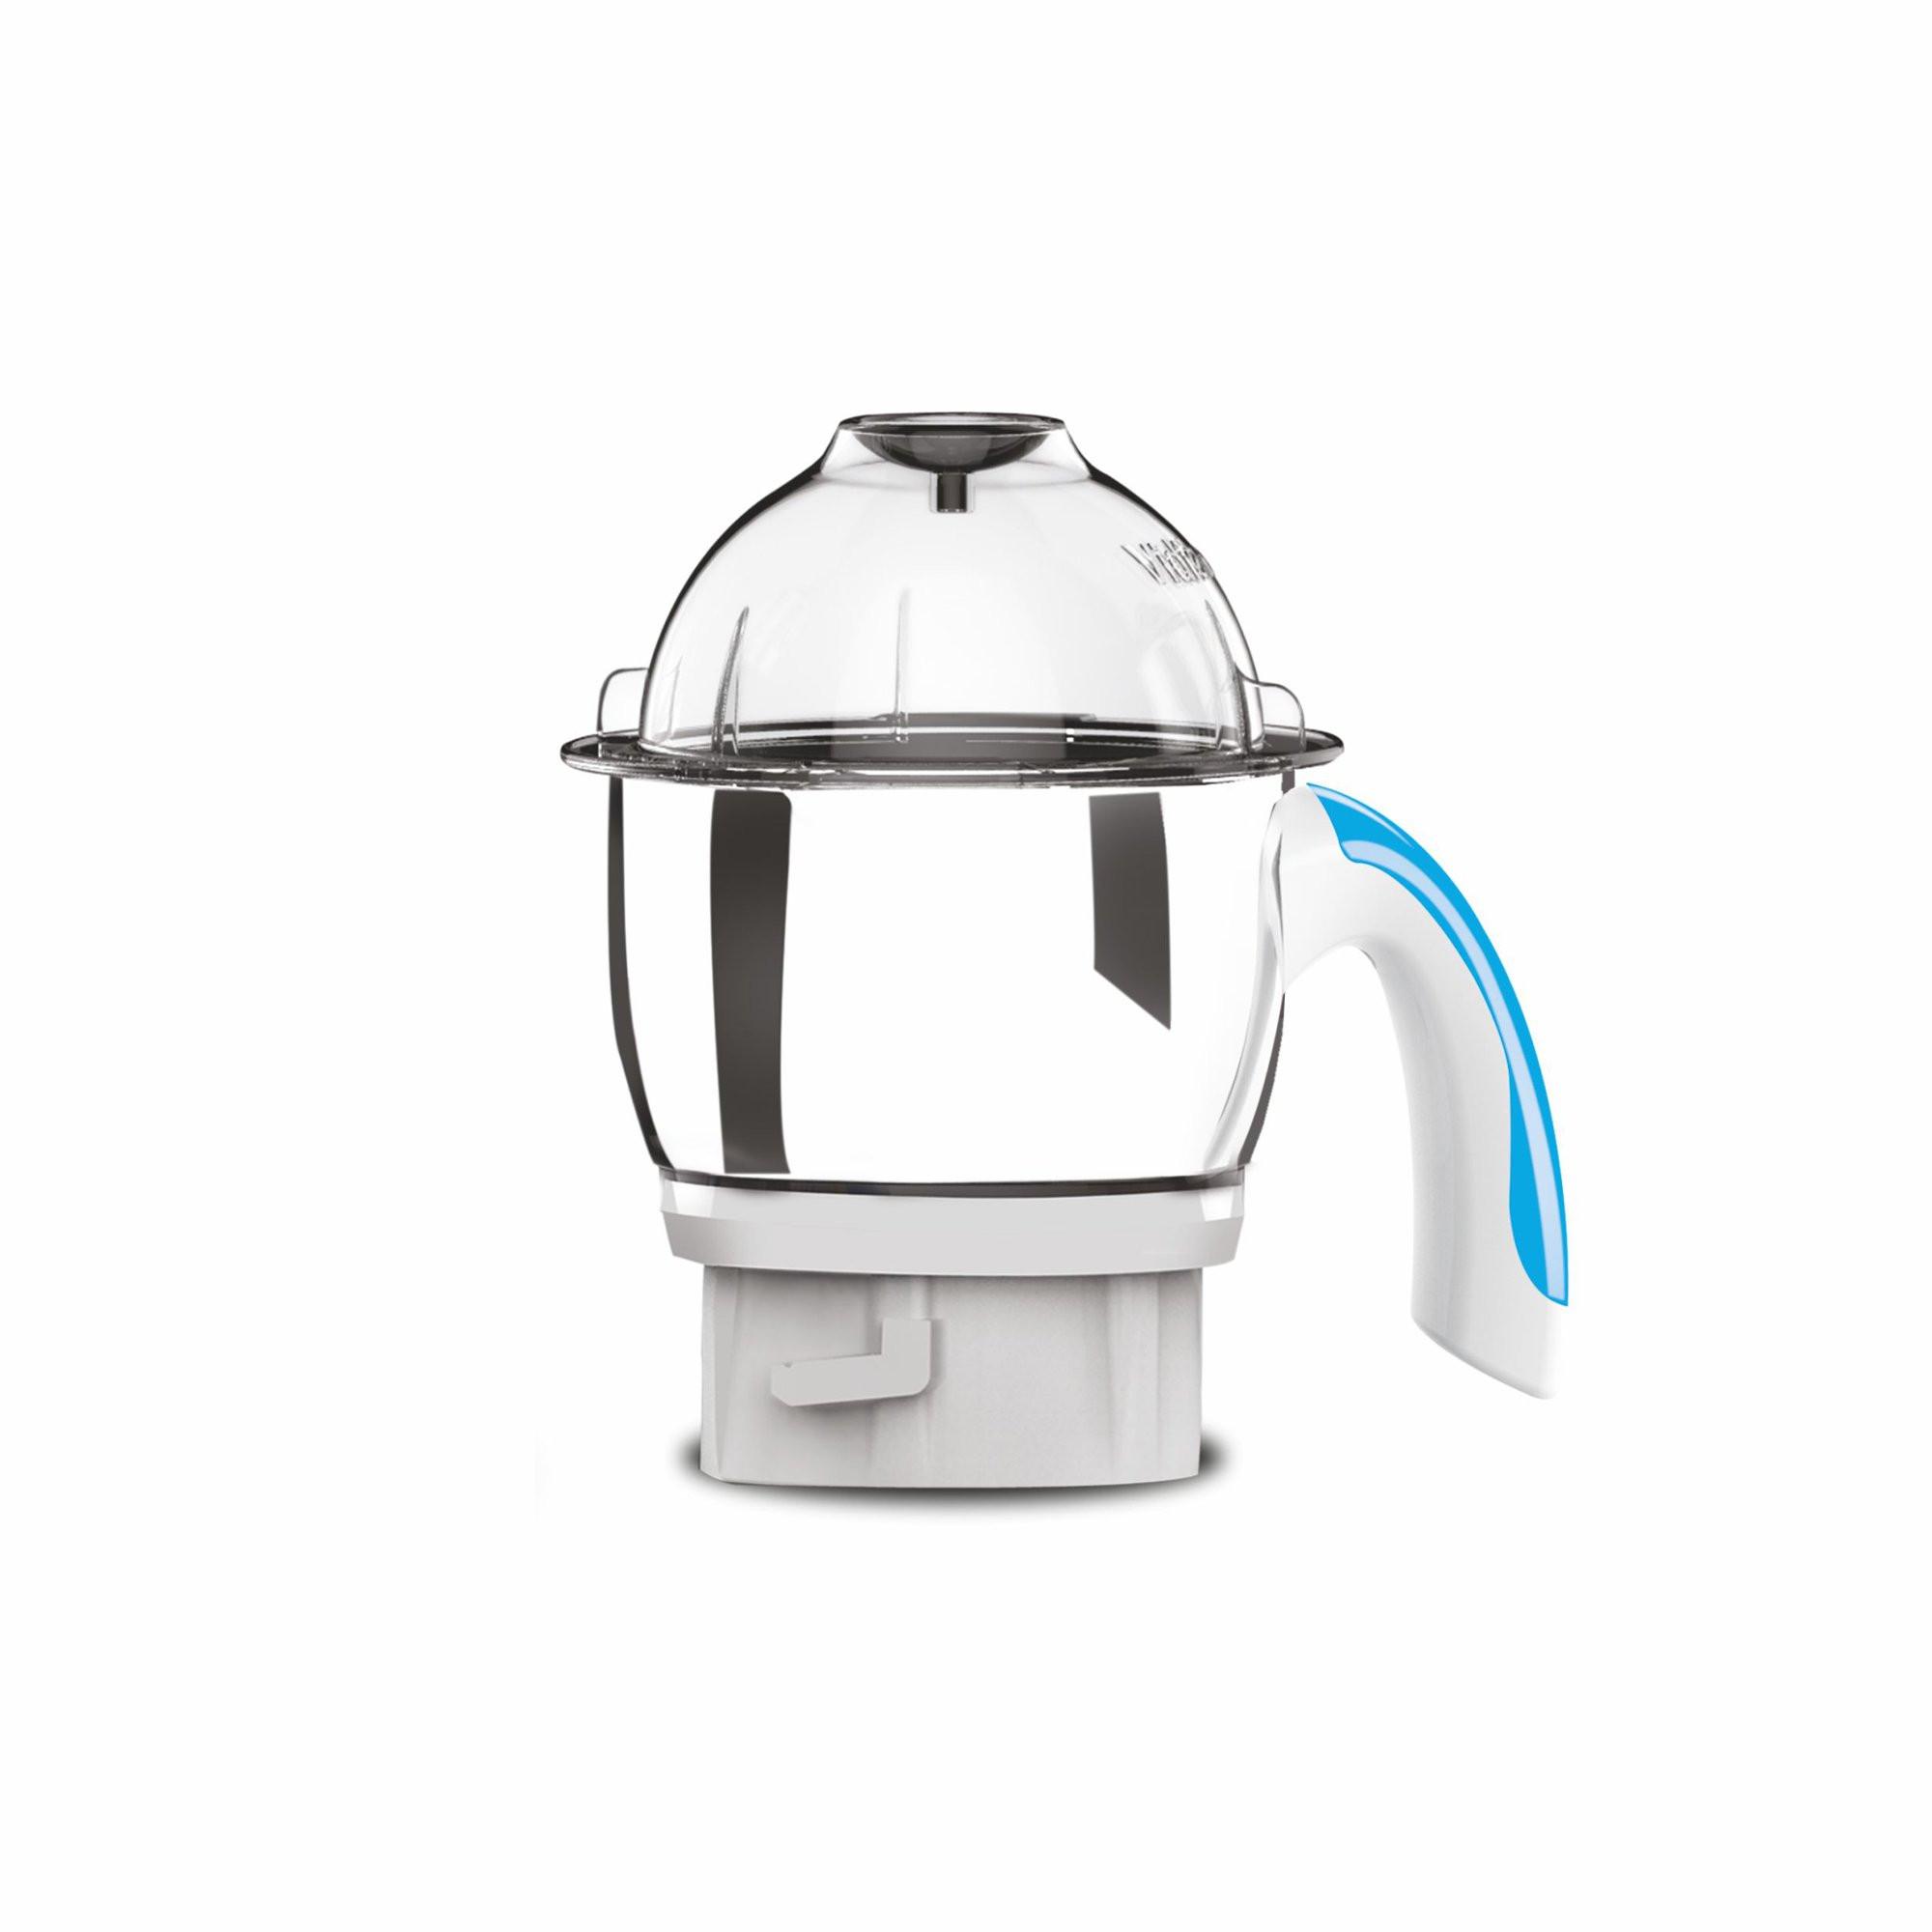 vidiem-versa-pride-750-watts-110v-with-3-jars